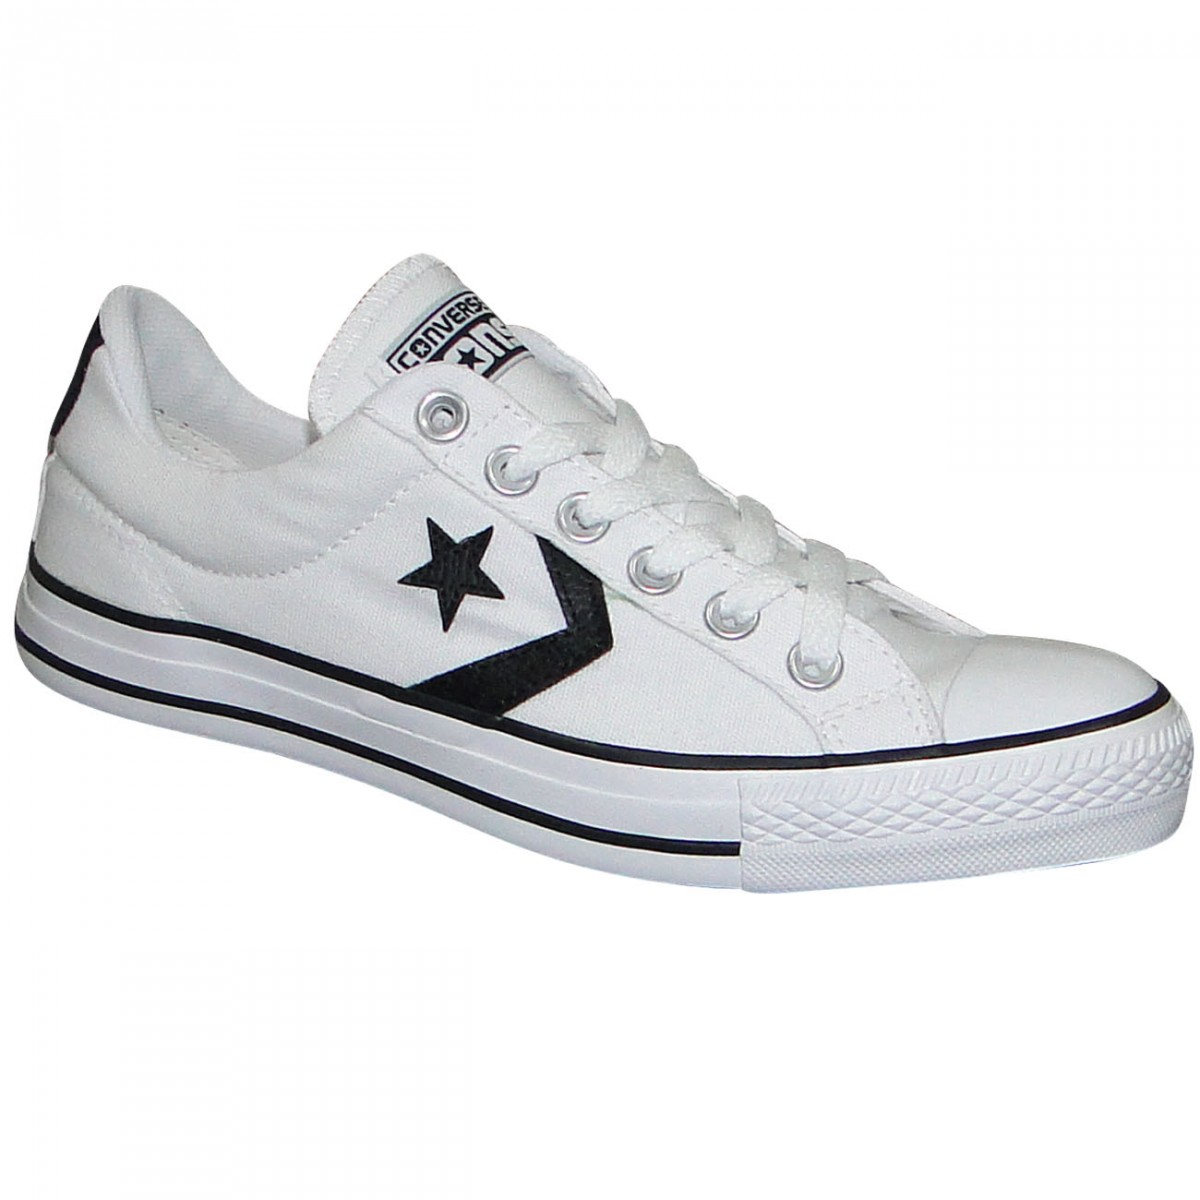 4a865937ee9 Tênis All Star Converse Star Player CO055208 - BRANCO PRETO - Chuteira Nike